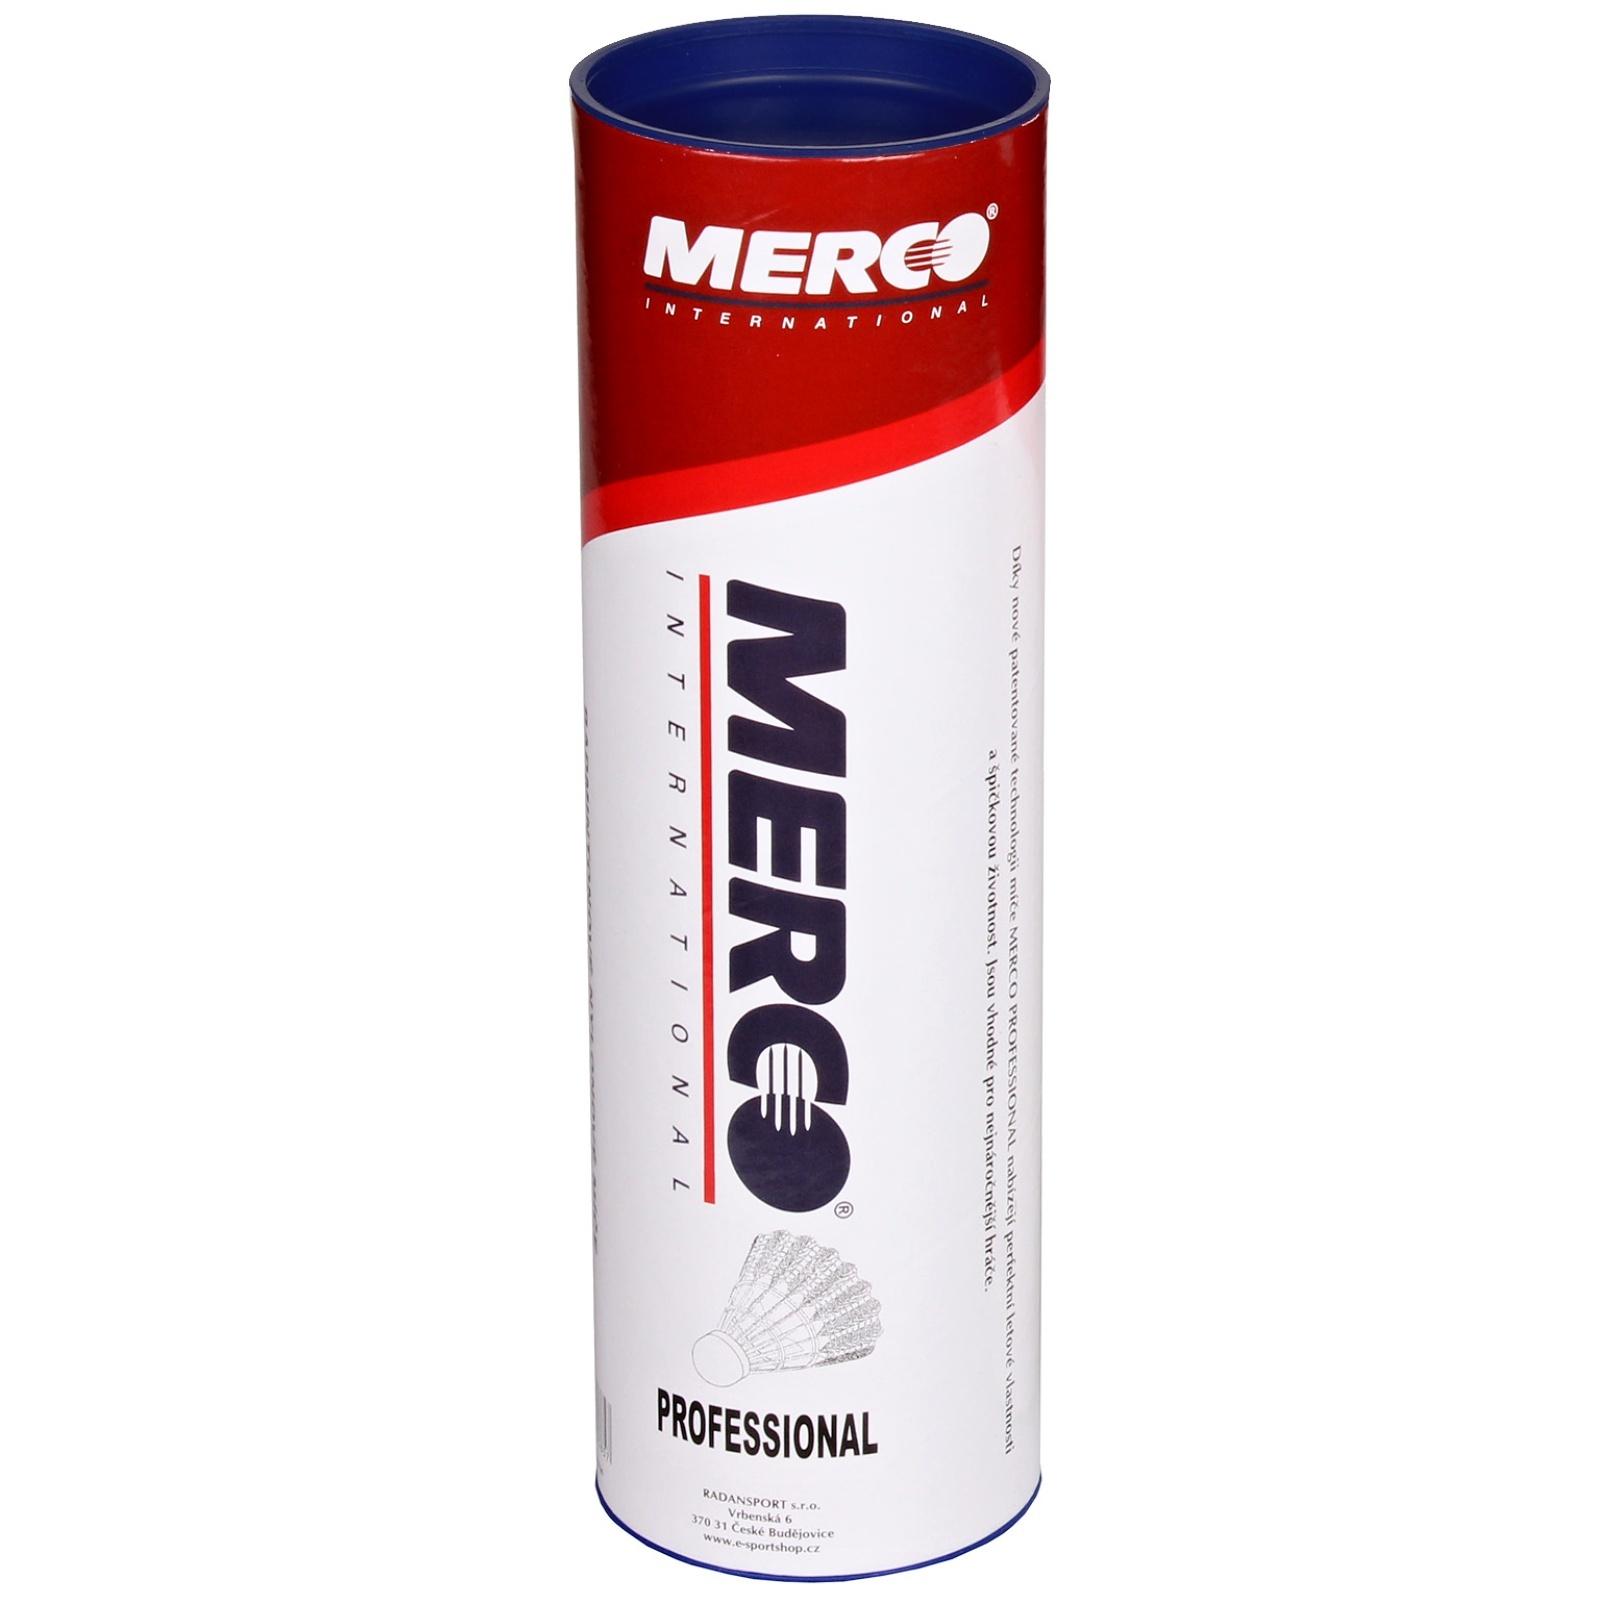 Badmintonové míčky MERCO Professional - černé